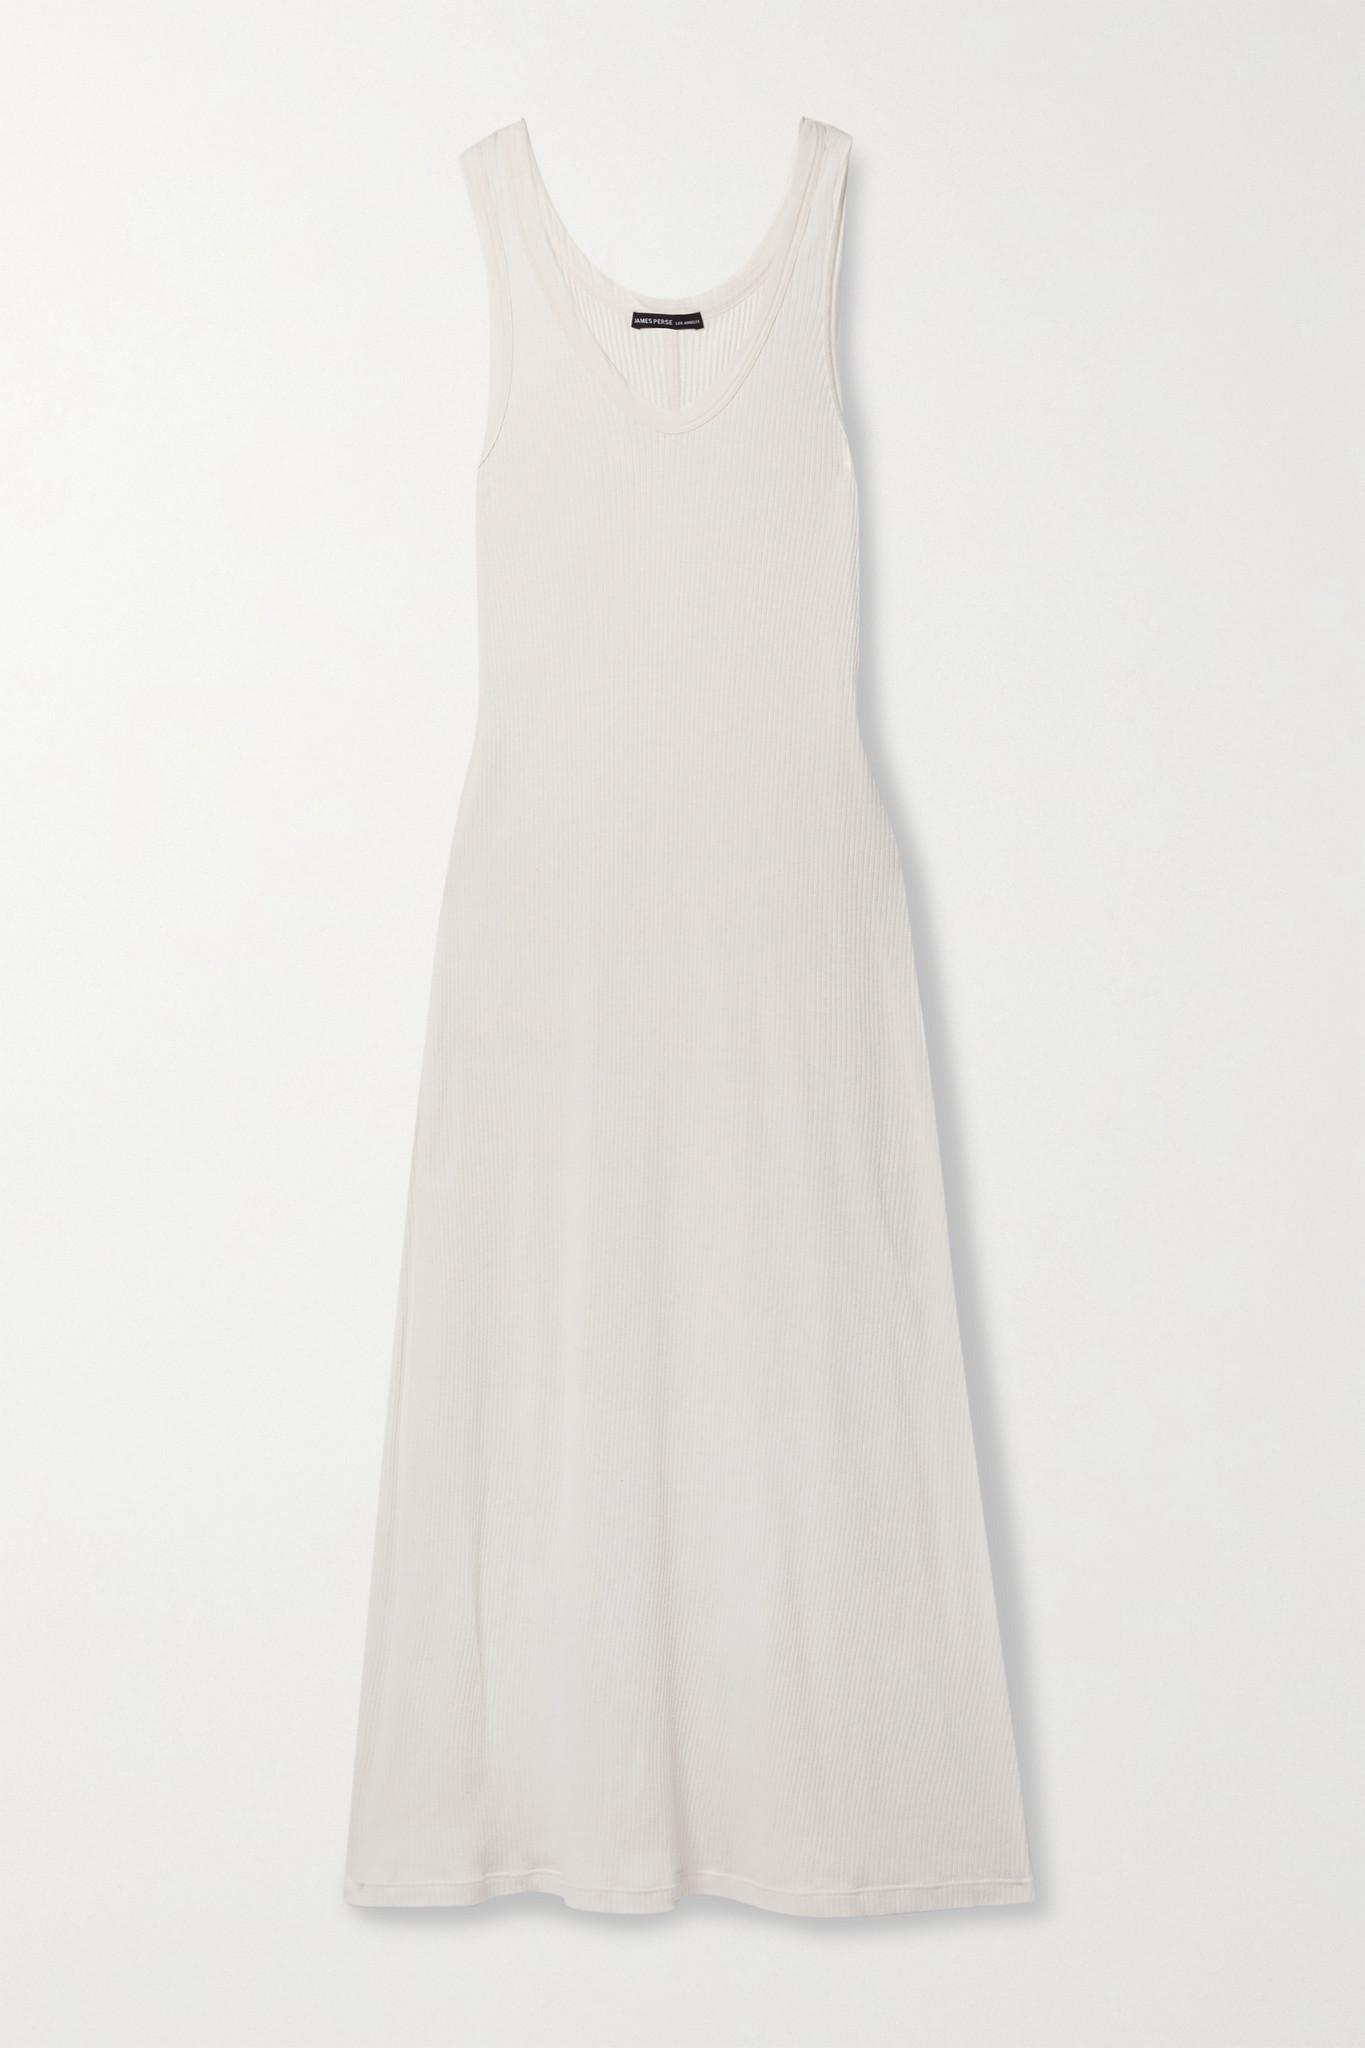 JAMES PERSE - Ribbed Cotton-blend Jersey Midi Dress - Pink - 3